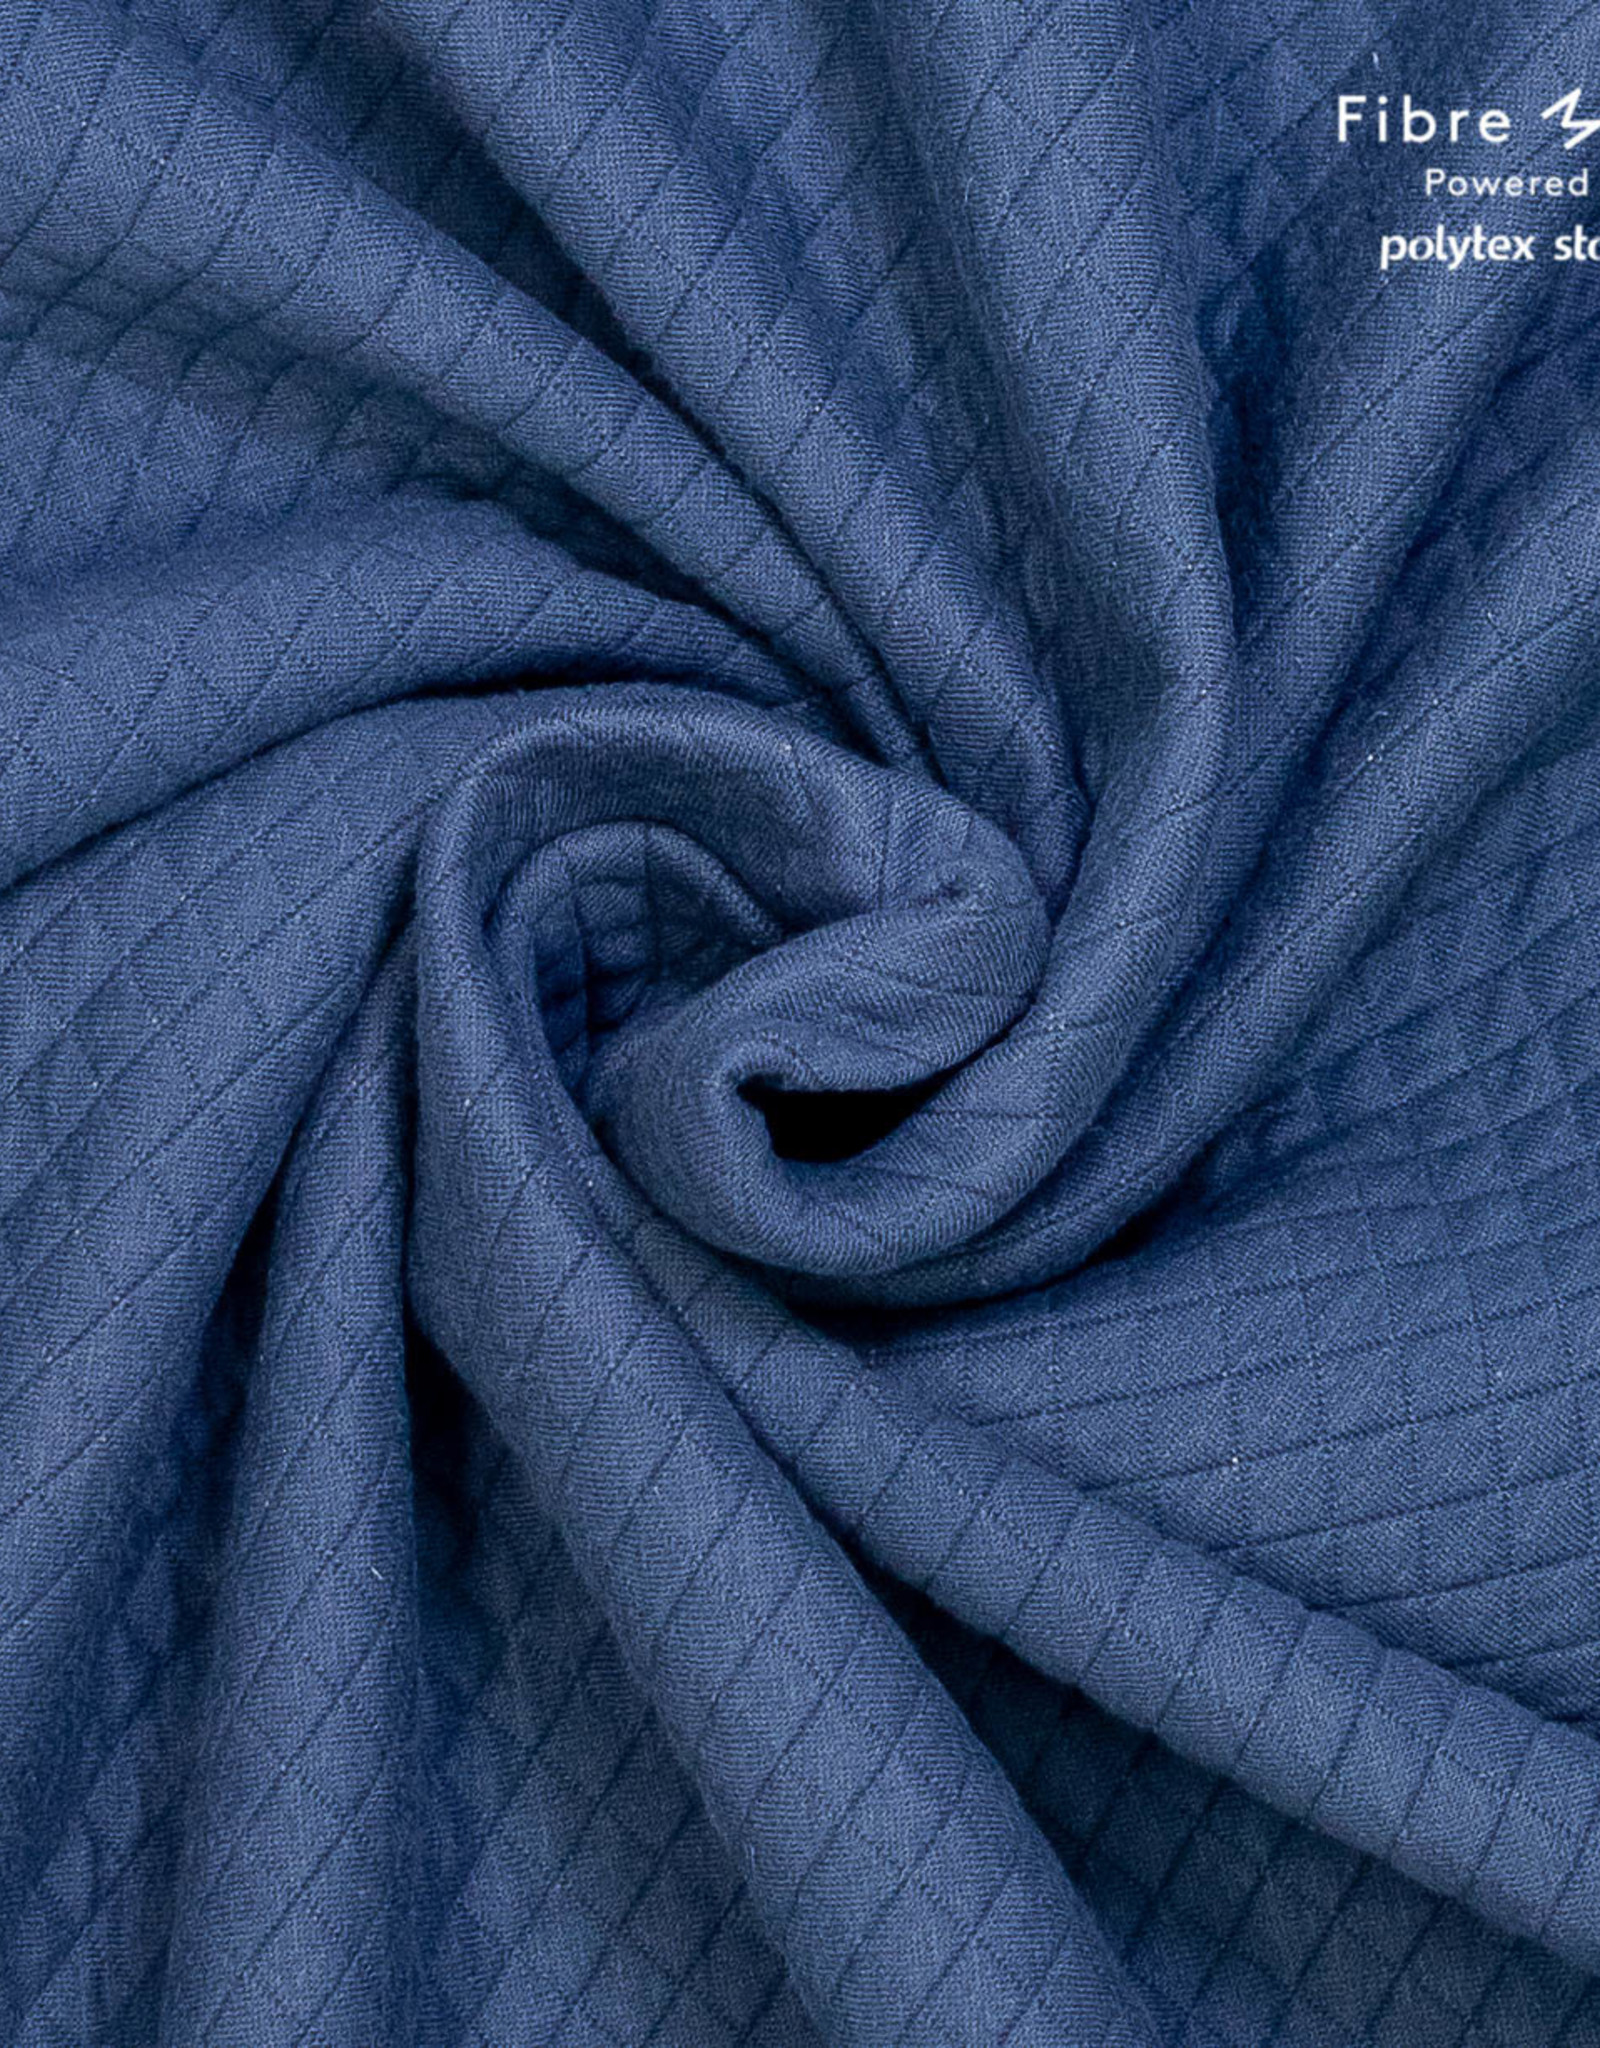 Fibre Mood Fibre Mood sweater diamond dark denim Debra